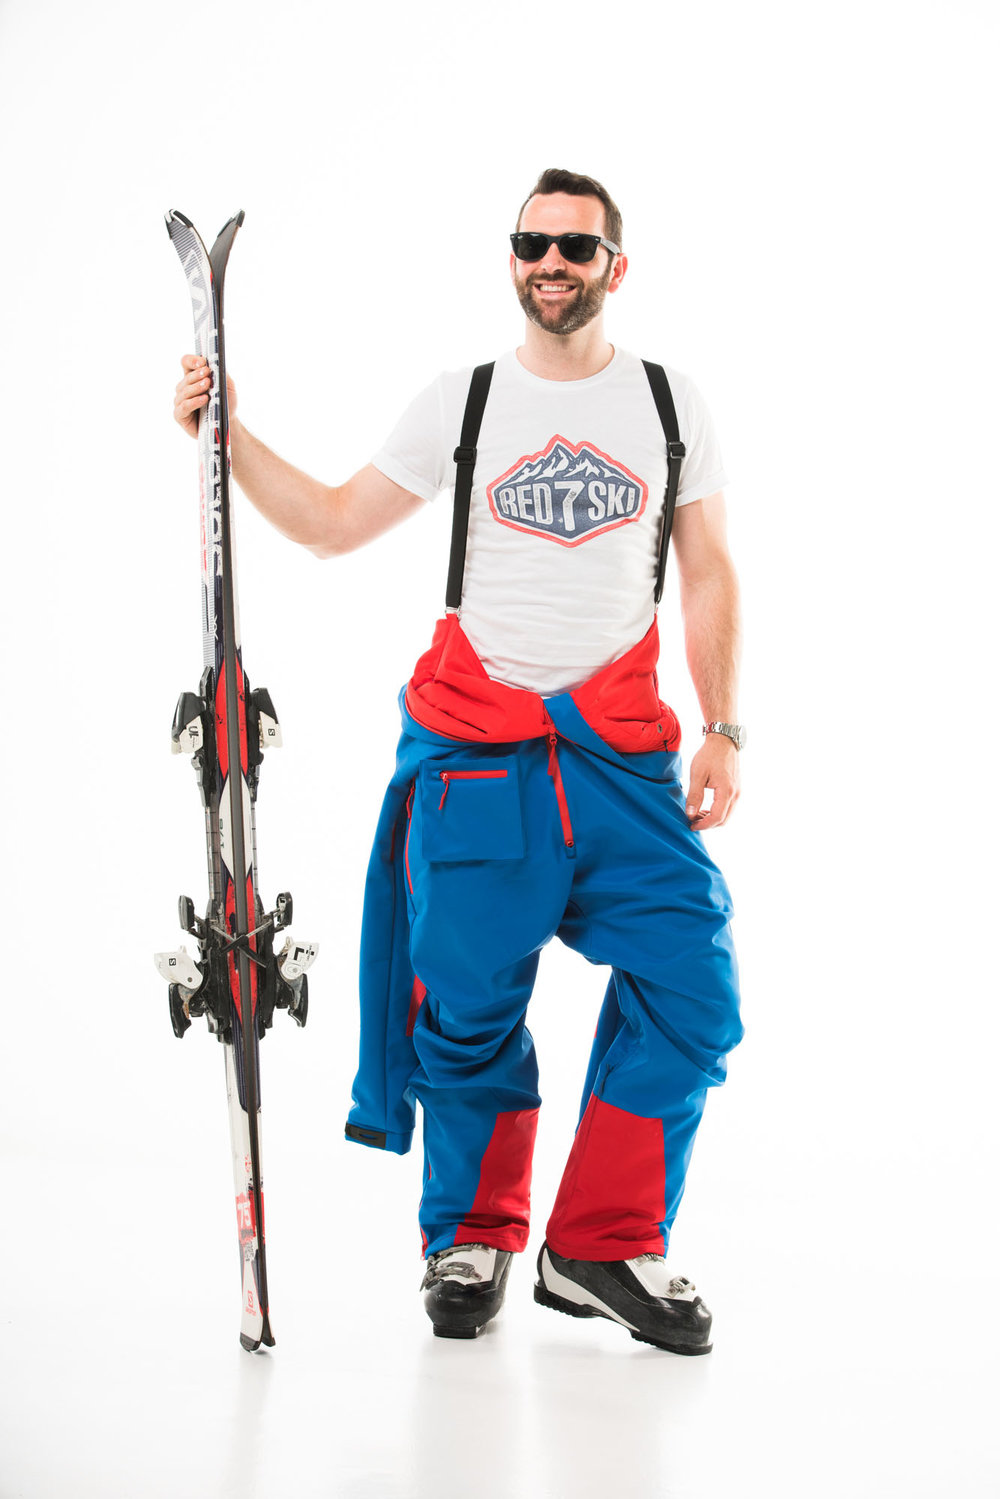 Blue+ski+suit_straps.jpg